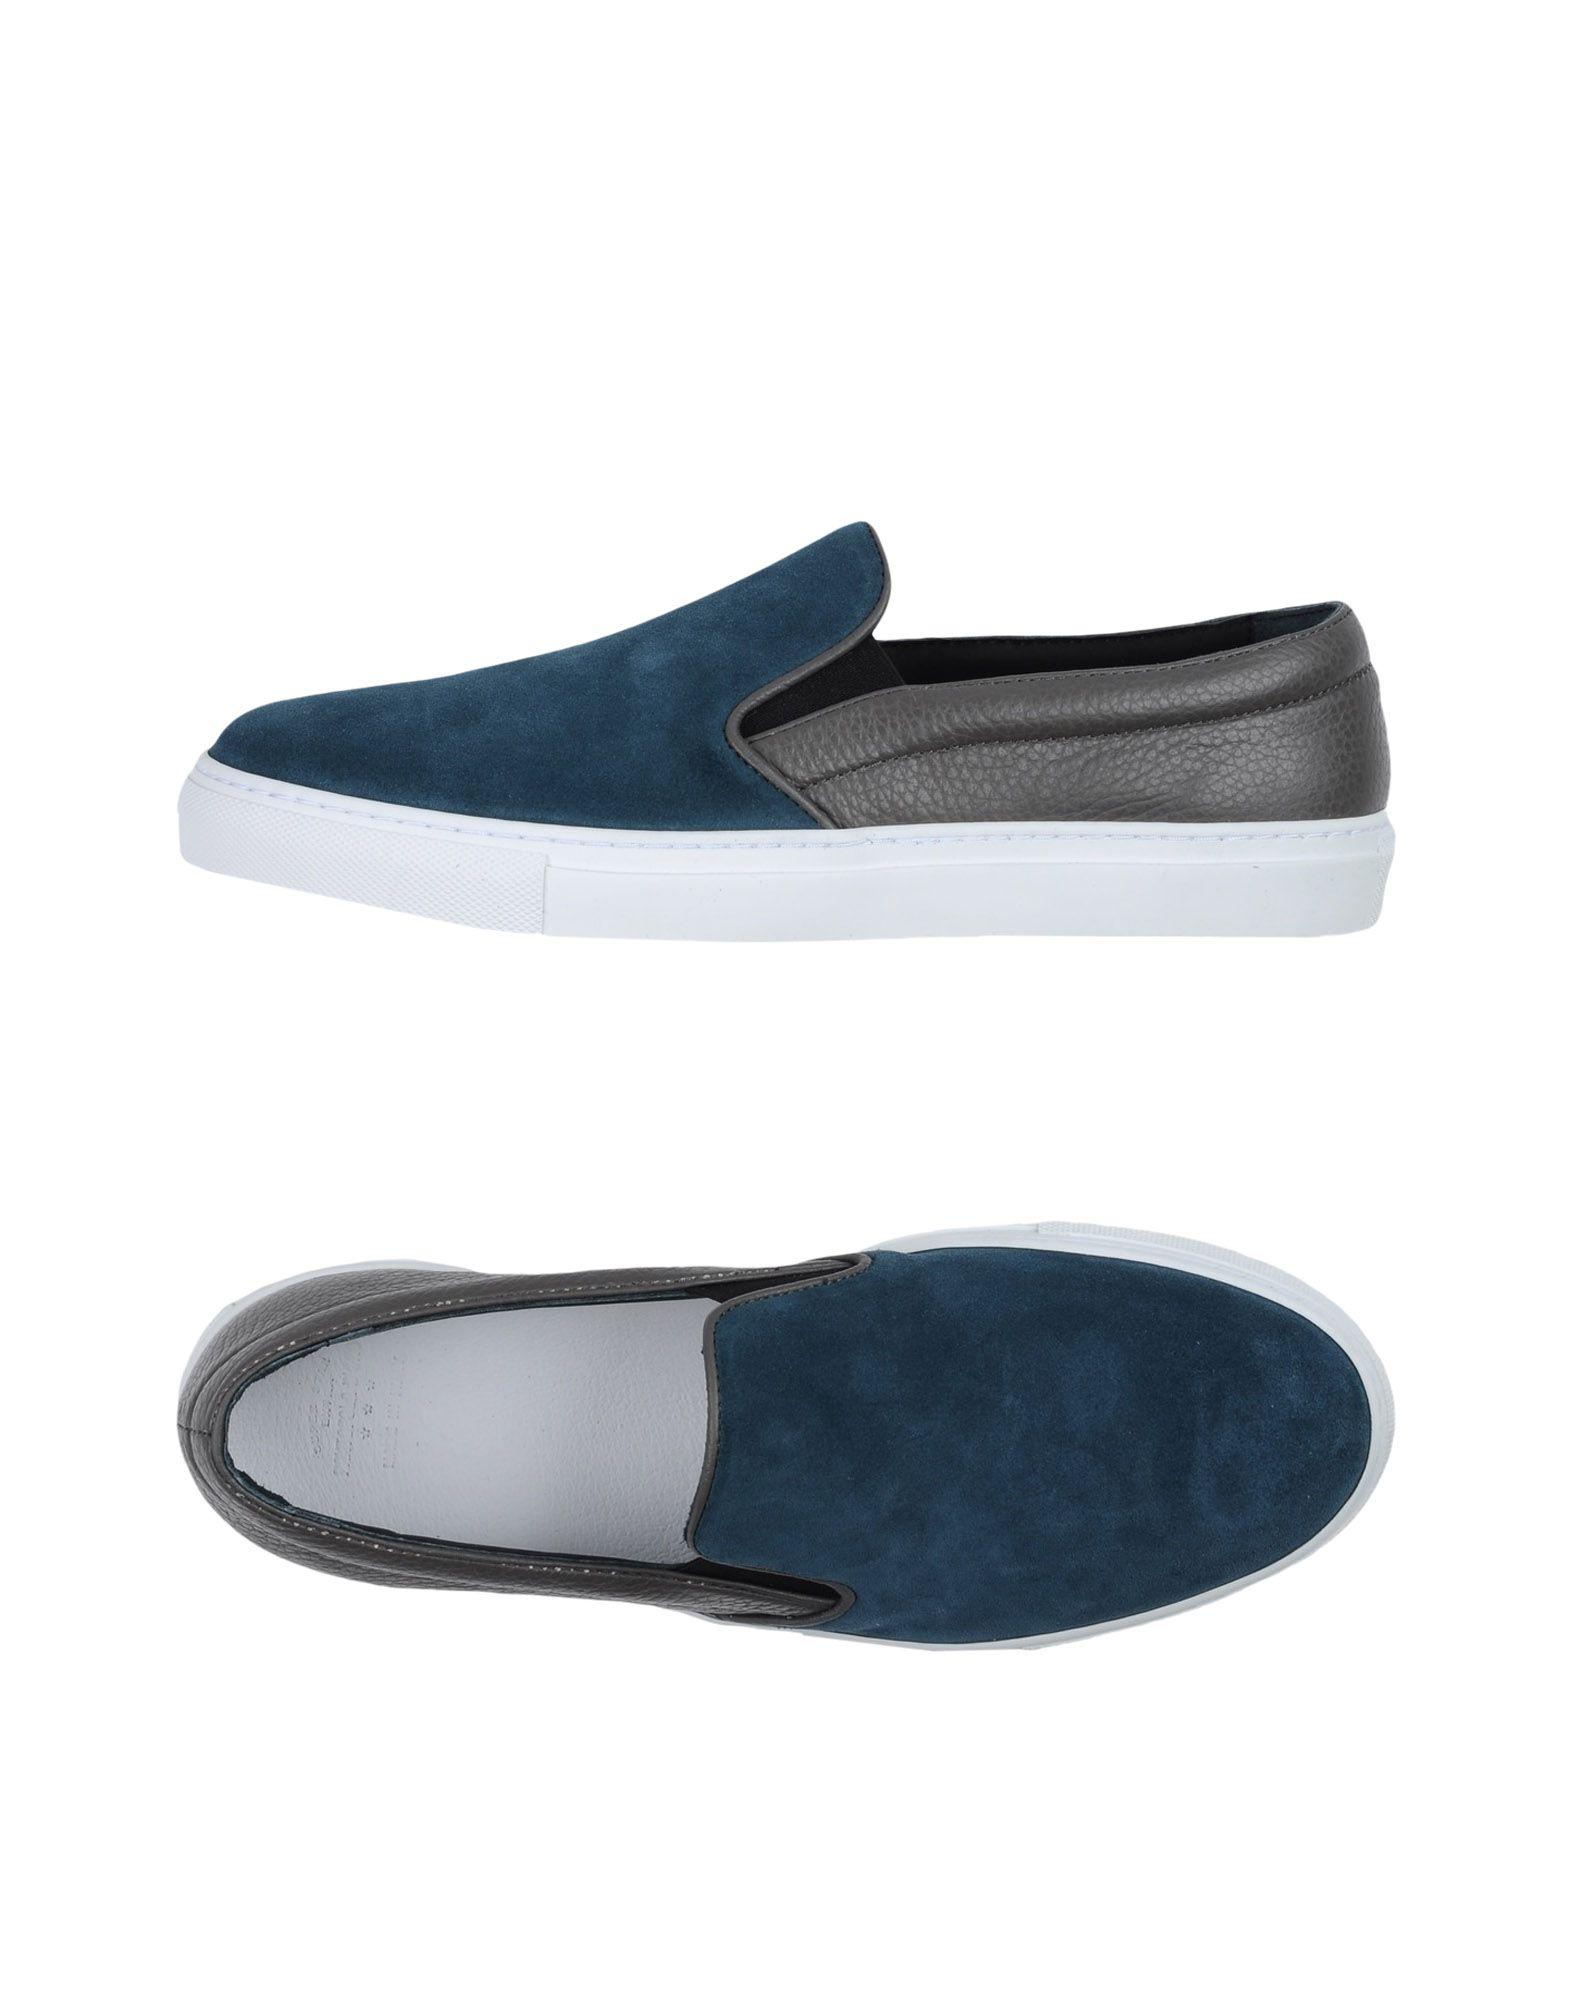 Pantofola D'oro Sneakers Herren    11339431JF Neue Schuhe 9f4898